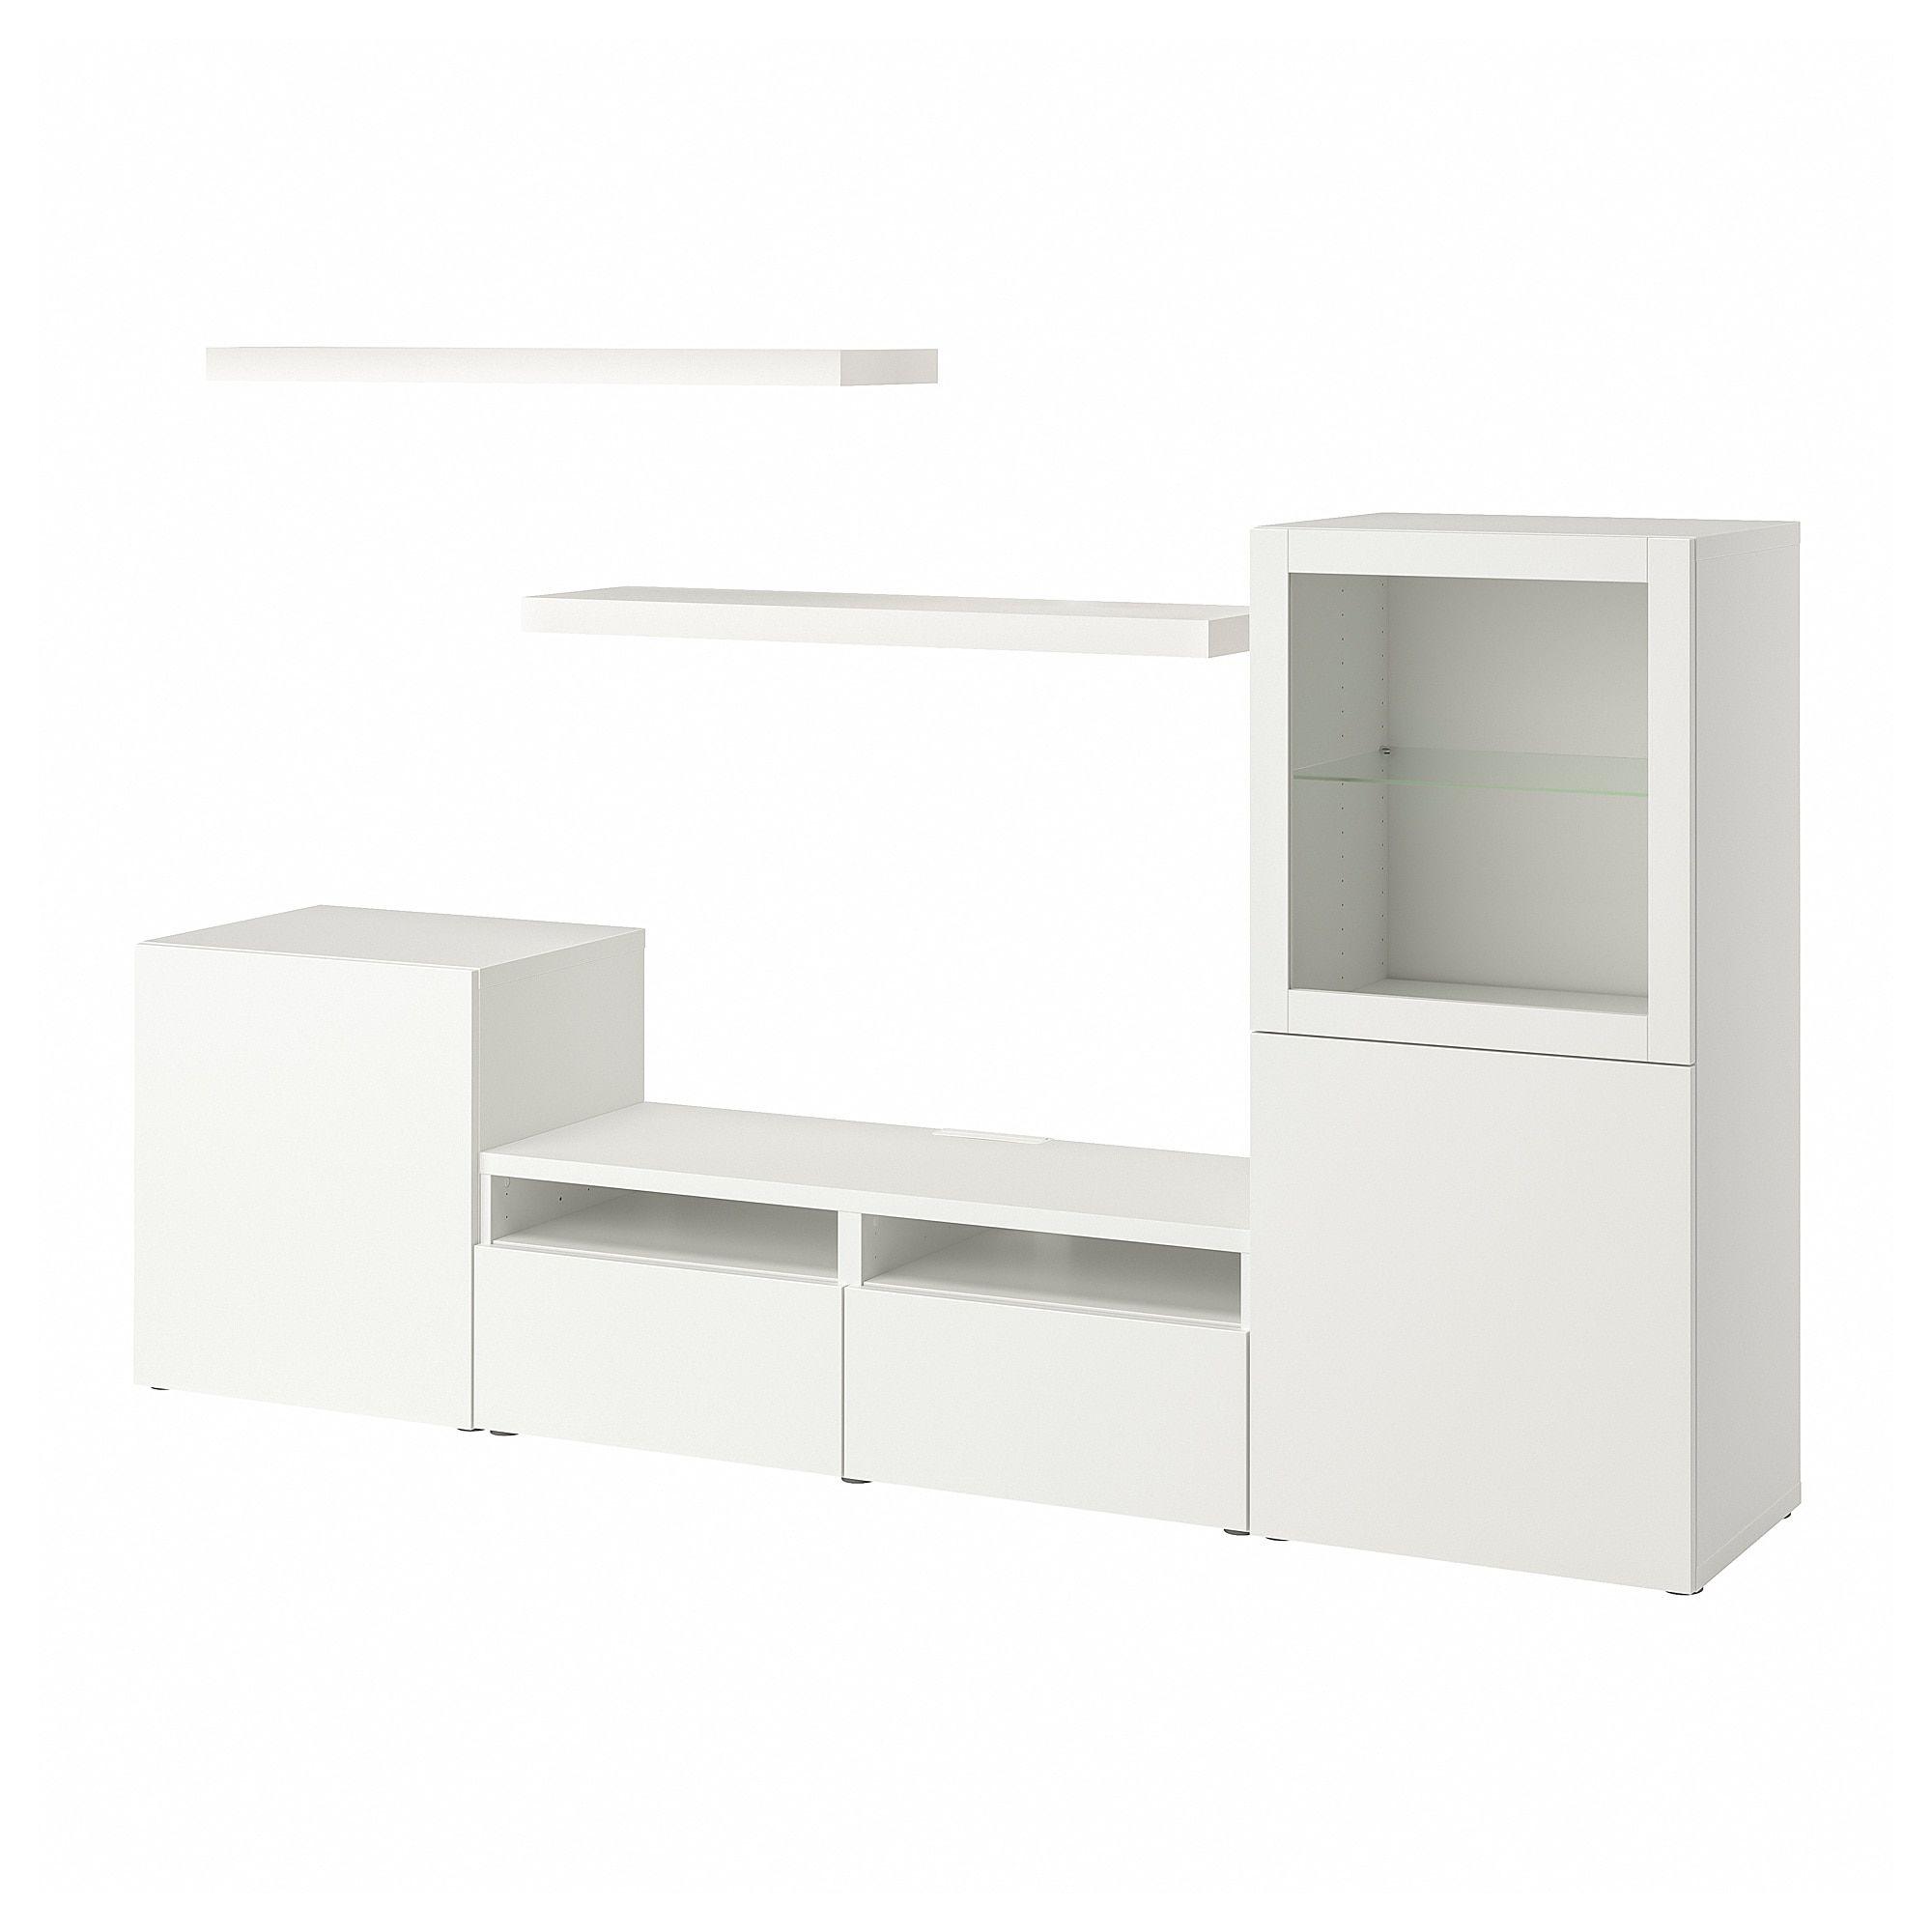 Besta Lack Ikea Tv Benches Komnit Furniture En 2020 Meuble Tele Meuble Tv Etageres Lack Ikea